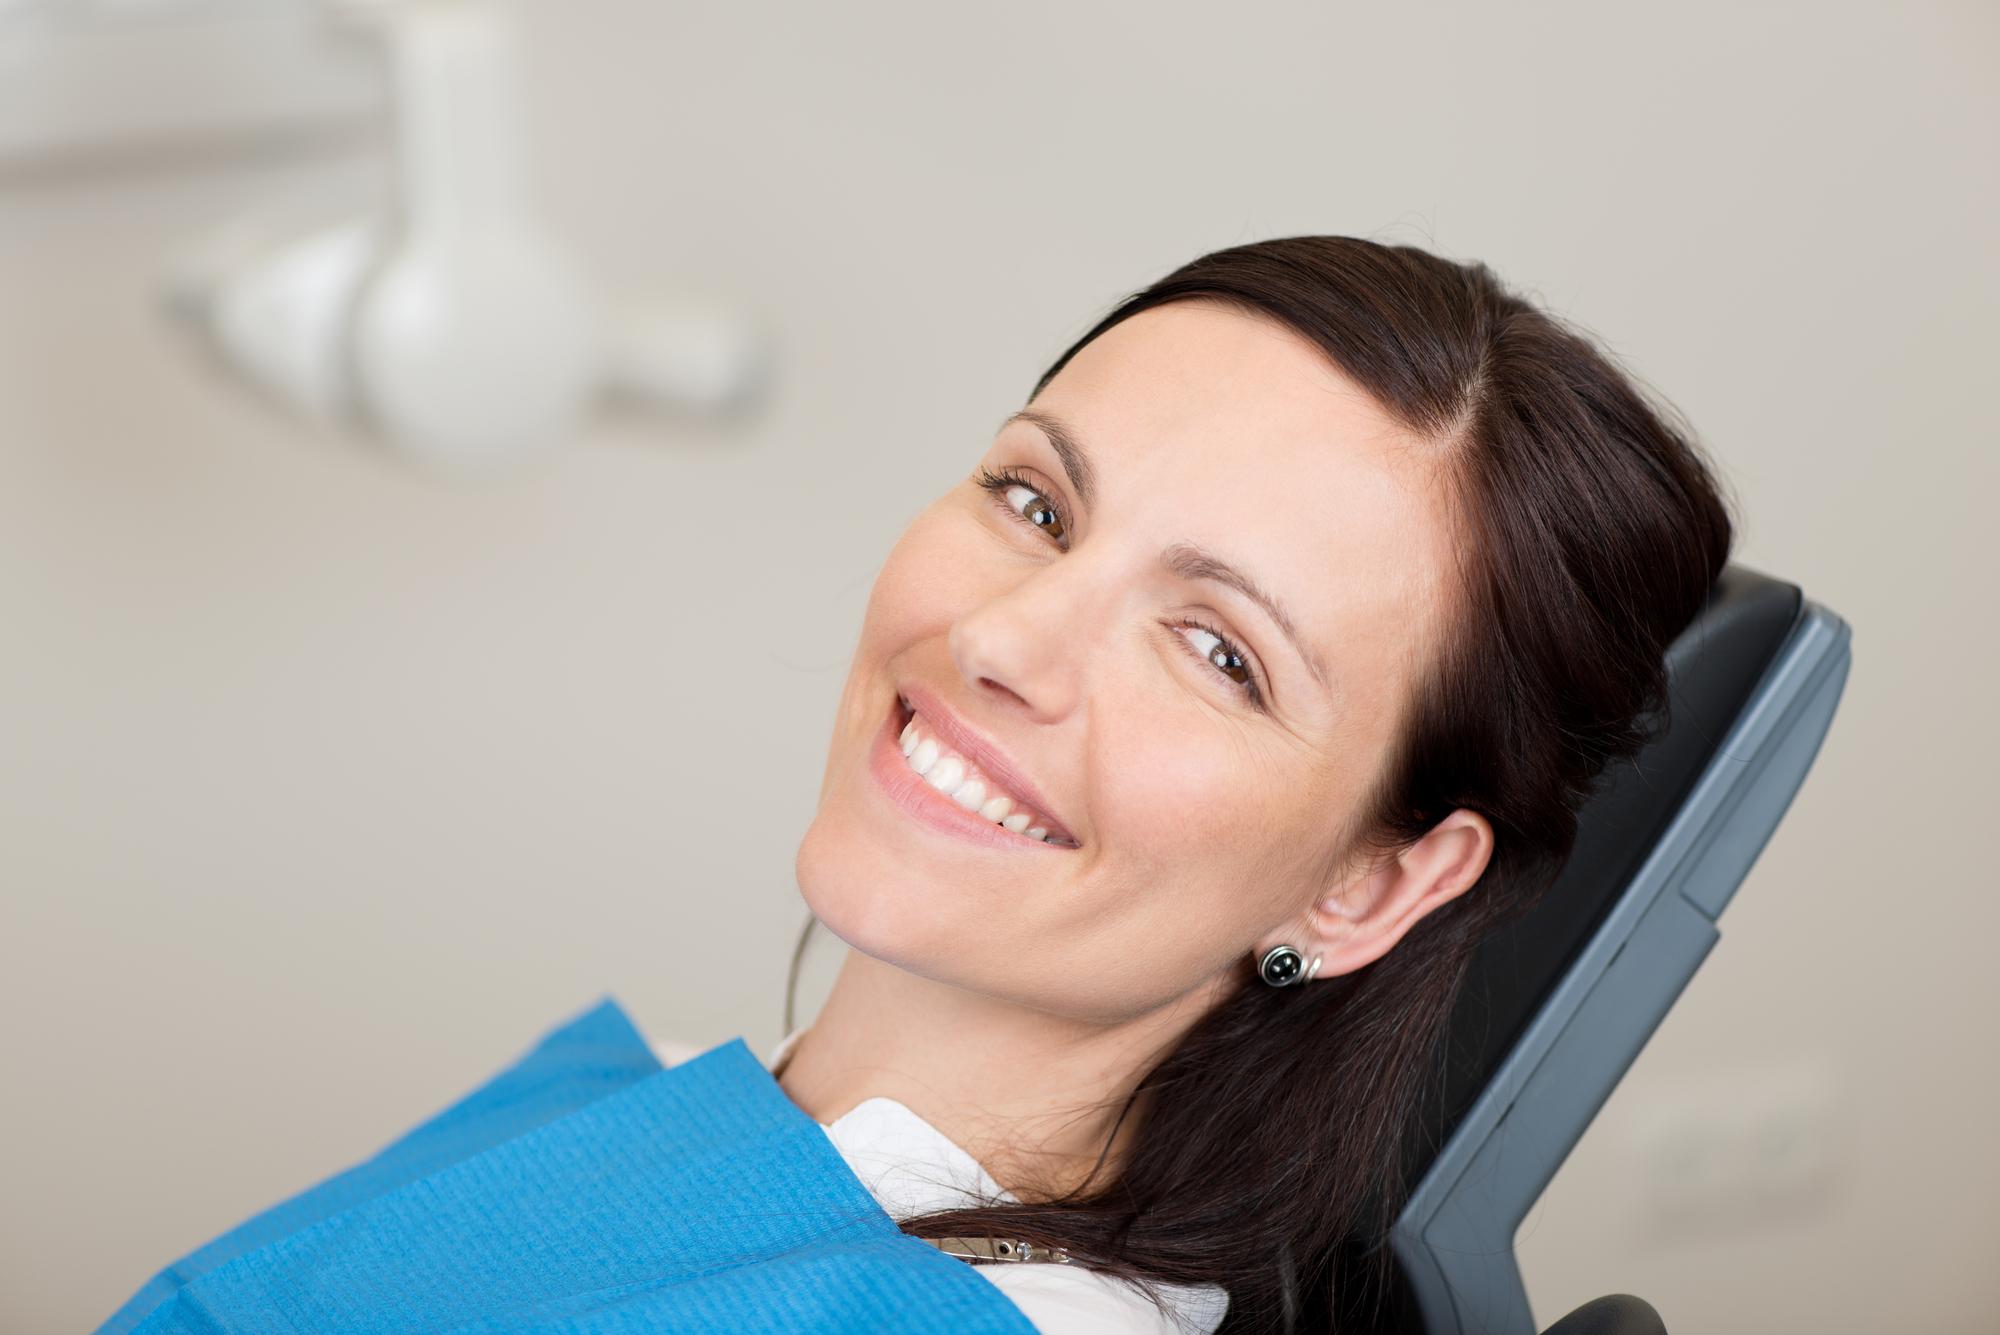 what is a same day dentist west palm beach?